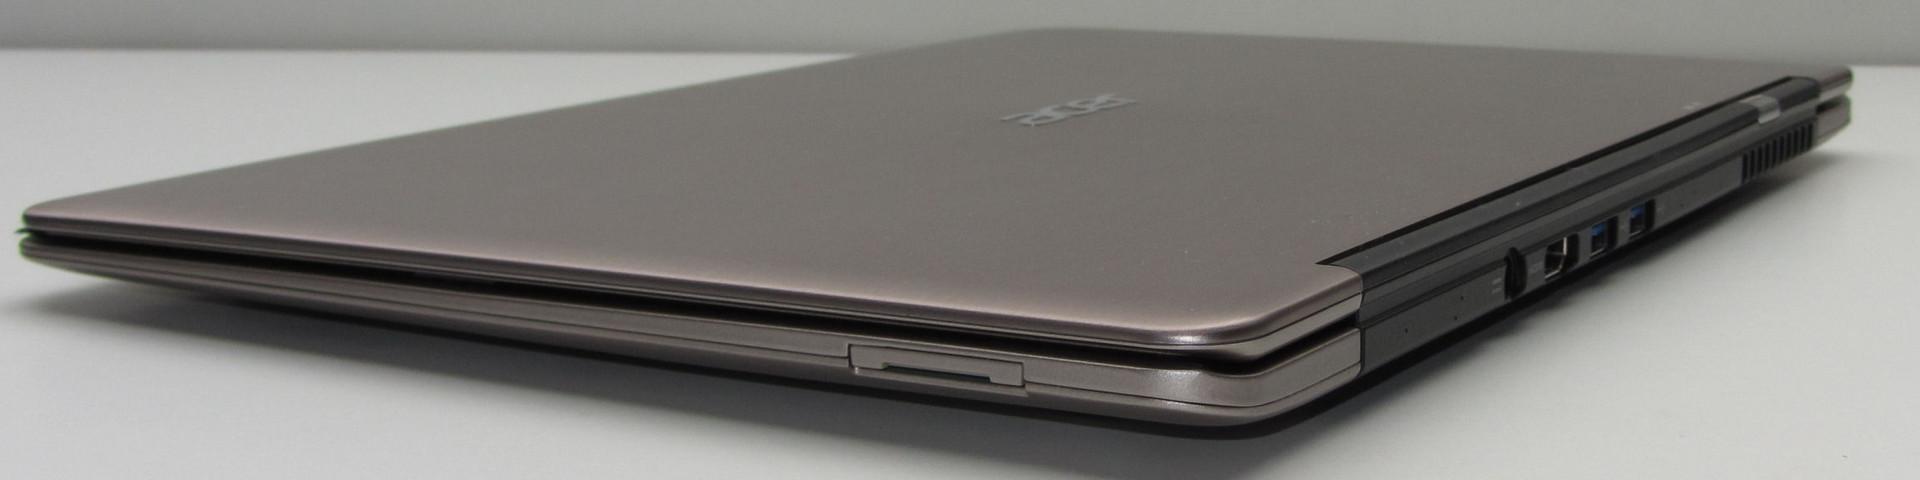 Acer Aspire S3-951 Intel RST Windows 8 Driver Download